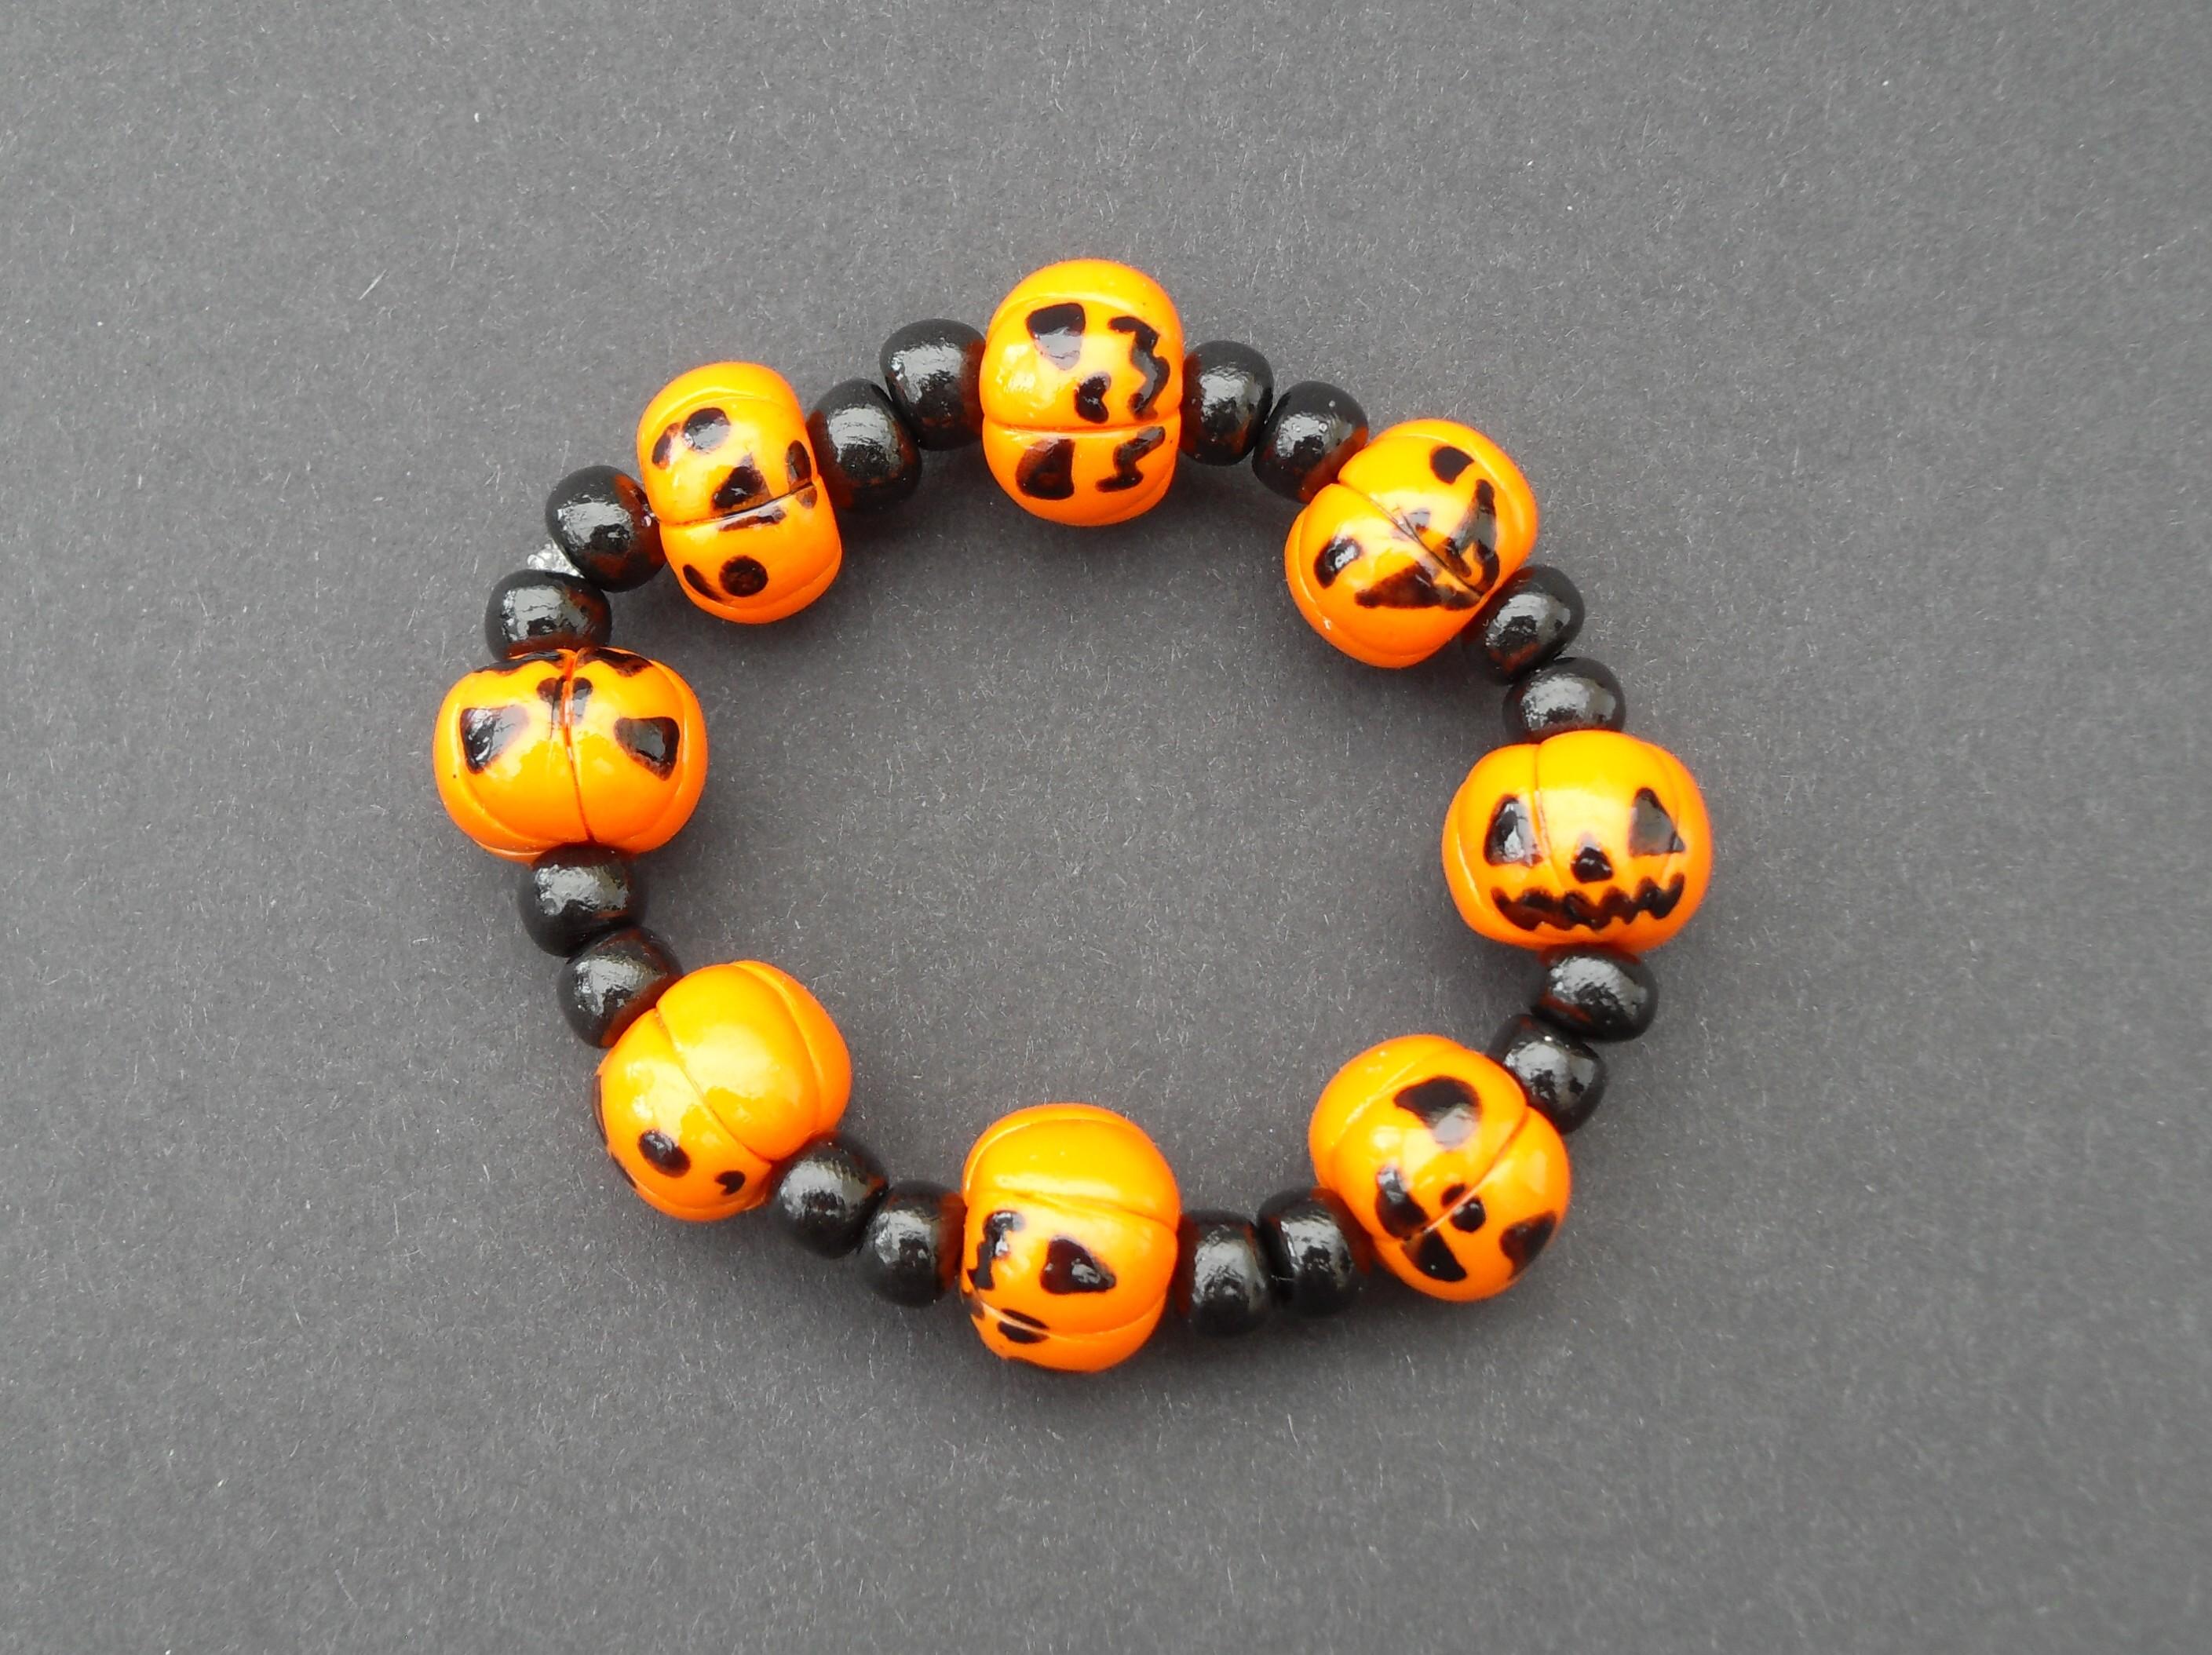 Halloween, spooky, creepy, cute, trick or treat, horror, handmade, novelty, season, kitsch, fan, jewellery, accessories, quirky, pumpkin, jackolantern, elasticated, charm, bracelet,